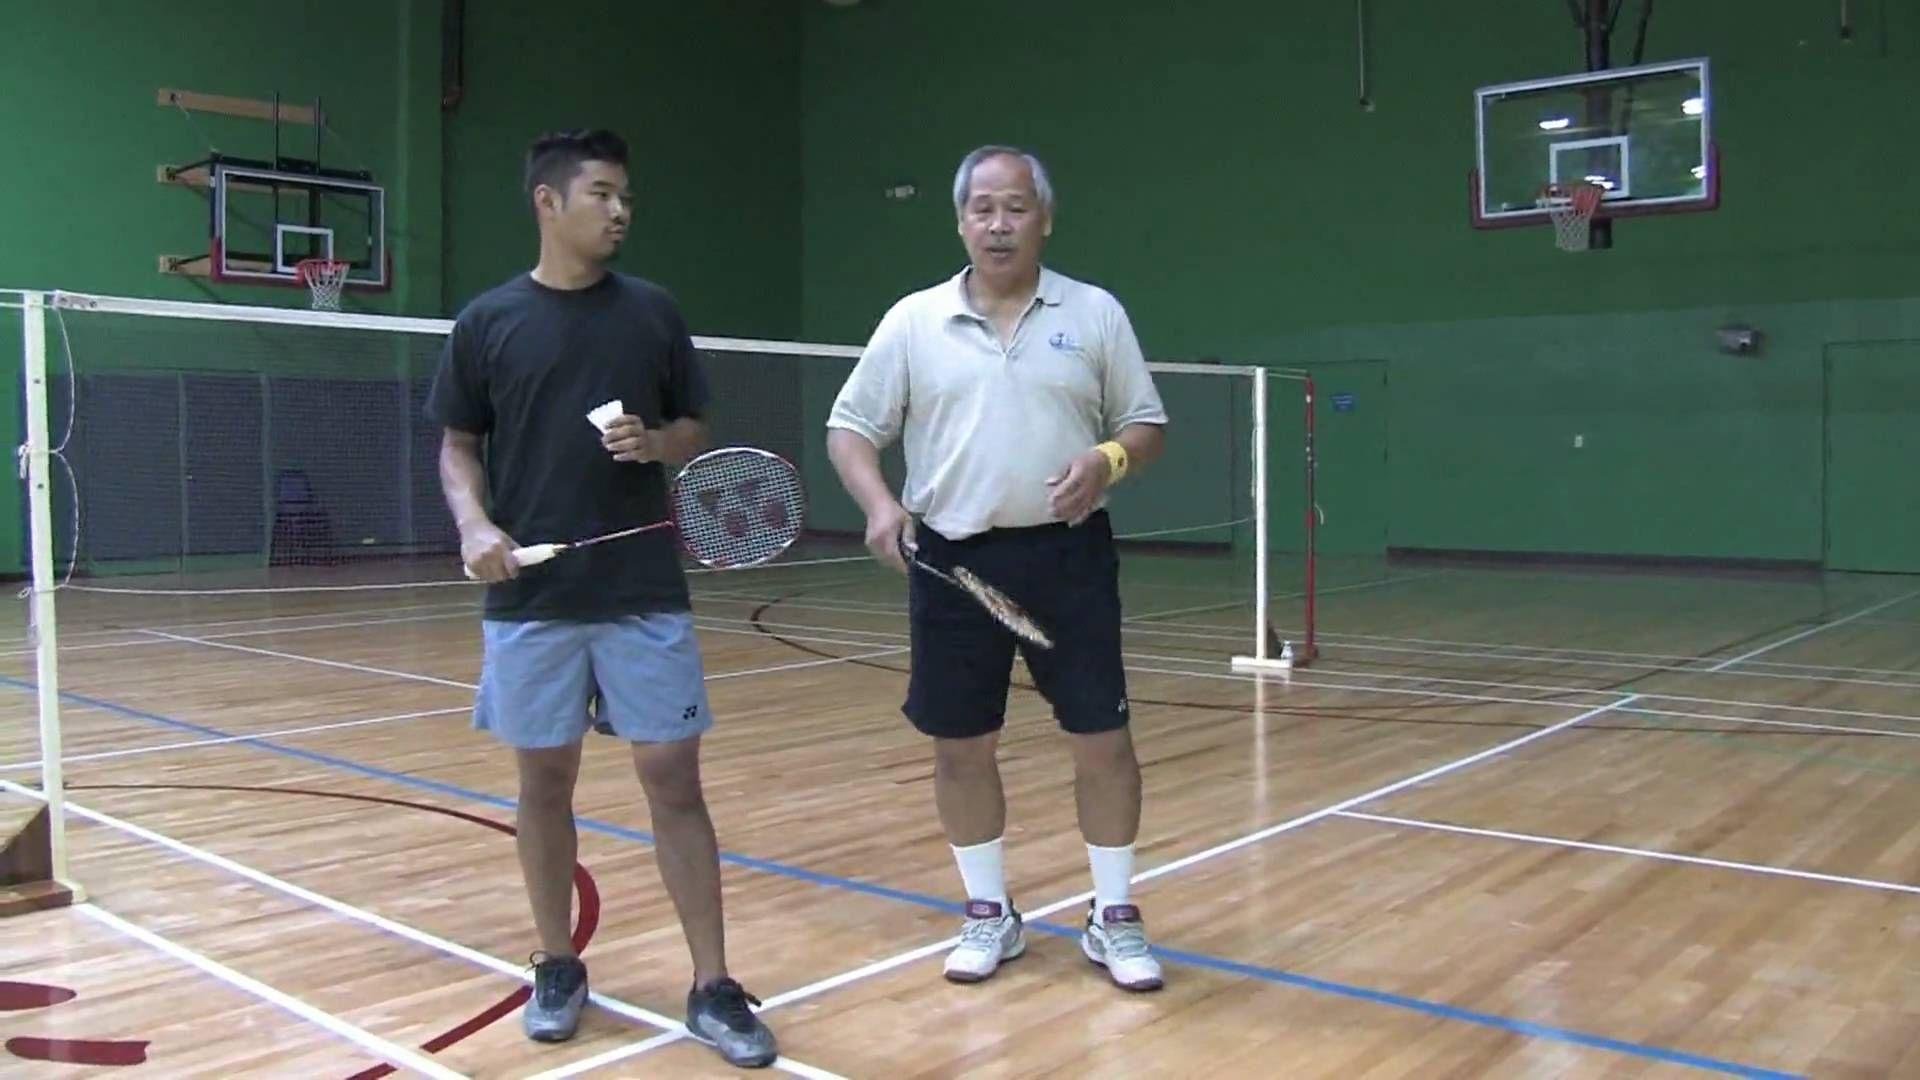 Badminton Tips Badminton for Beginnersserving stance